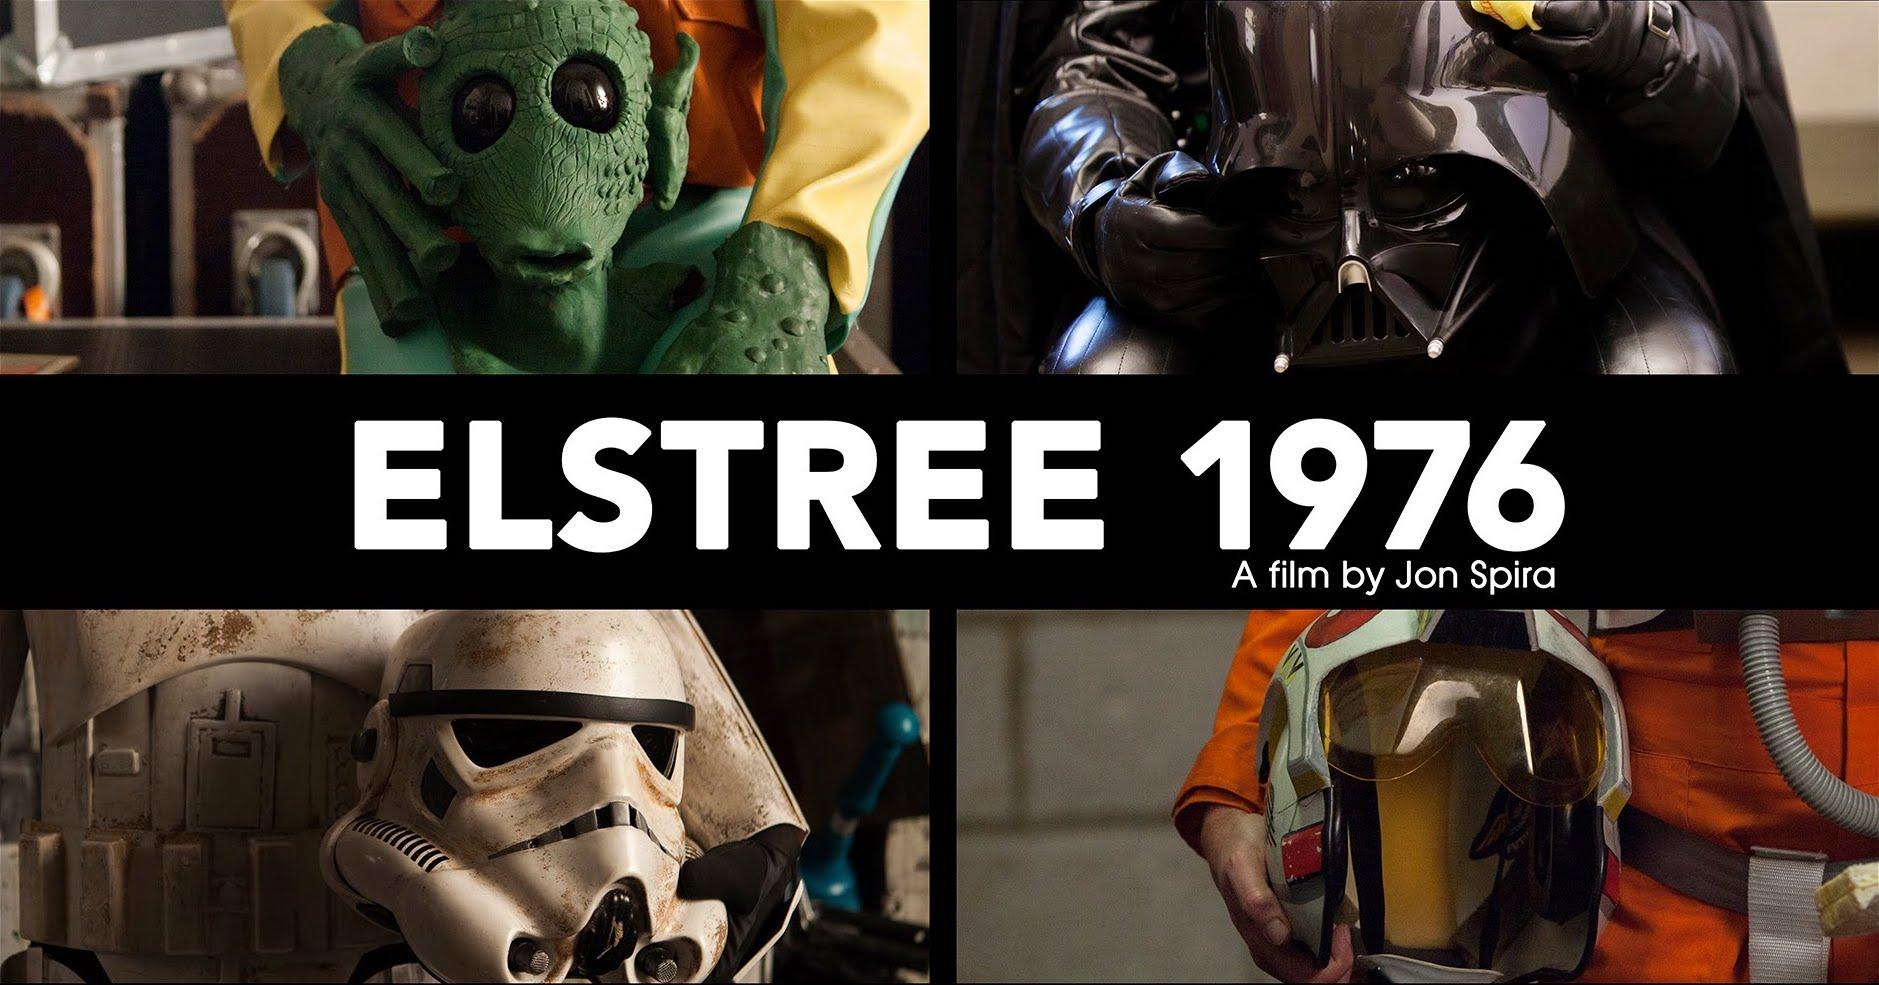 Elstree 1976 #VuttanaVisione